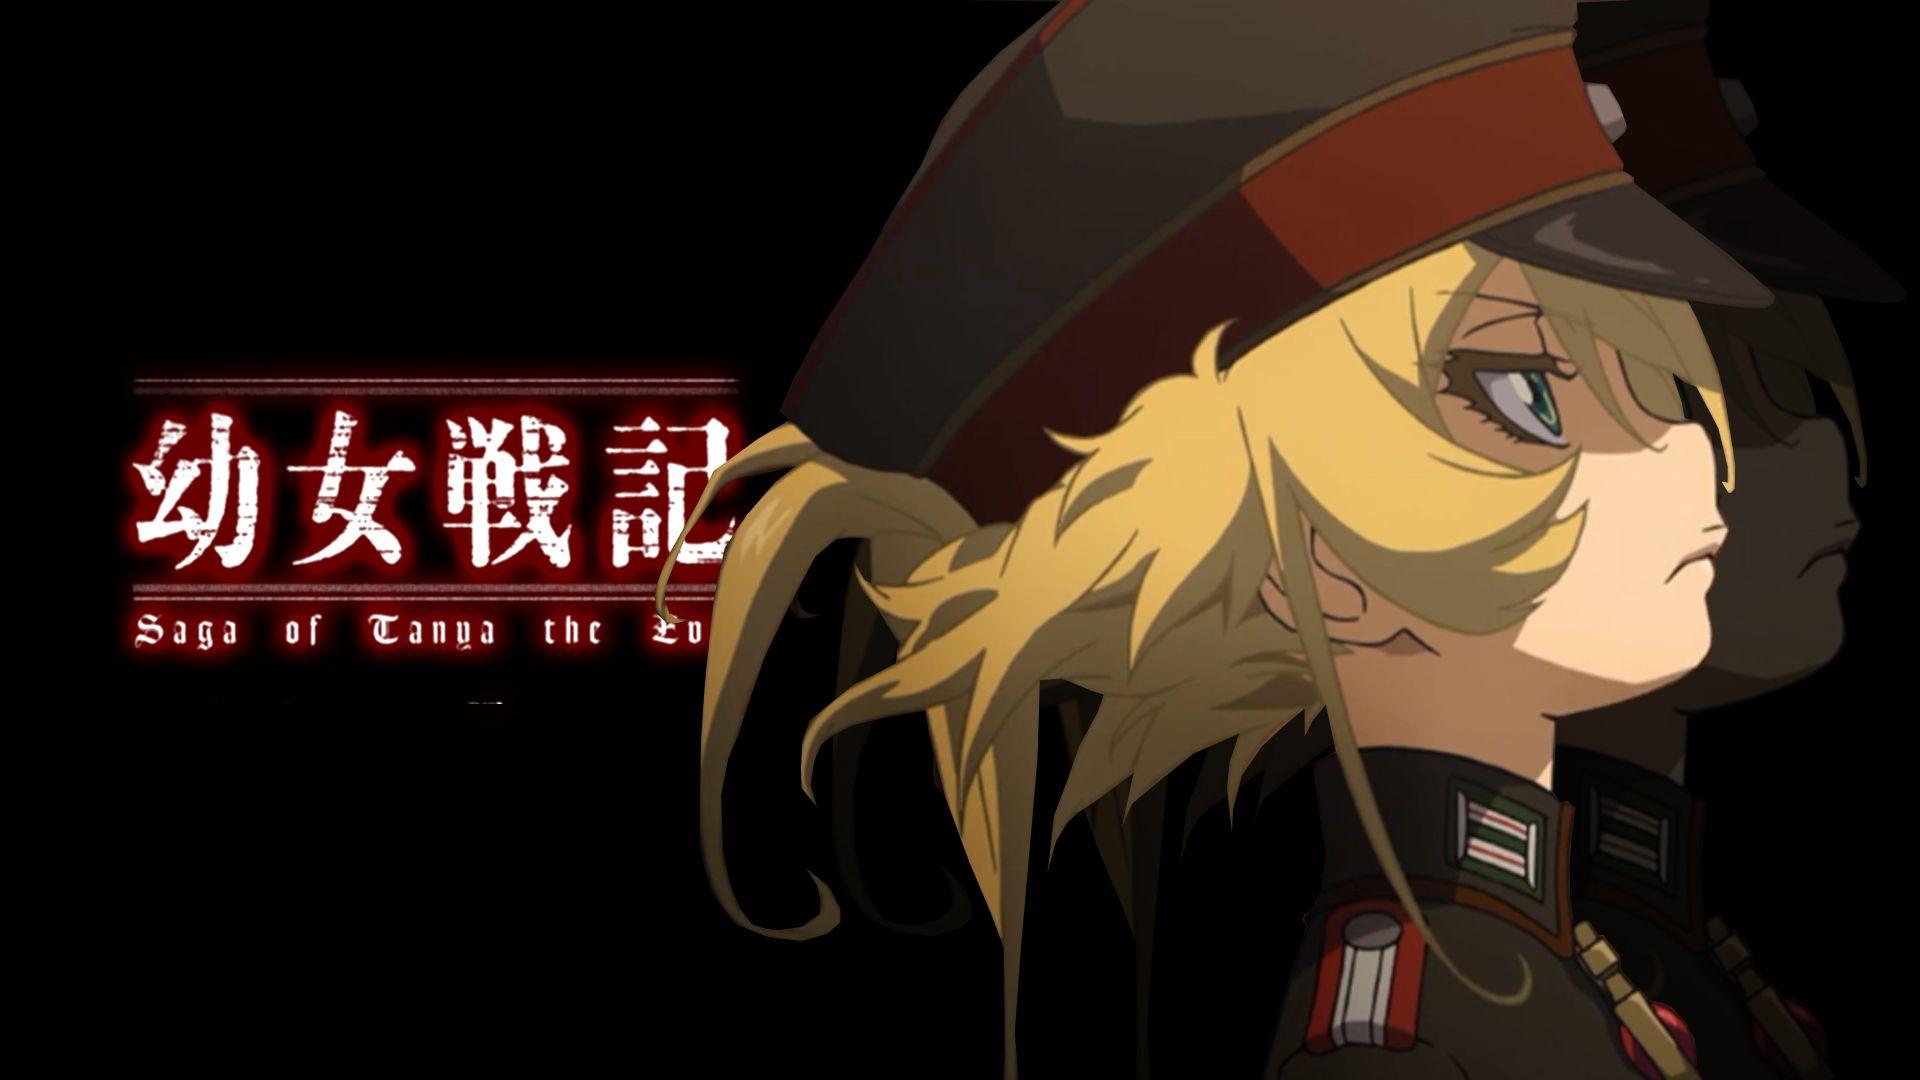 Tanya Degurechaff Youjo Senki Anime Wallpaper Hd 3340